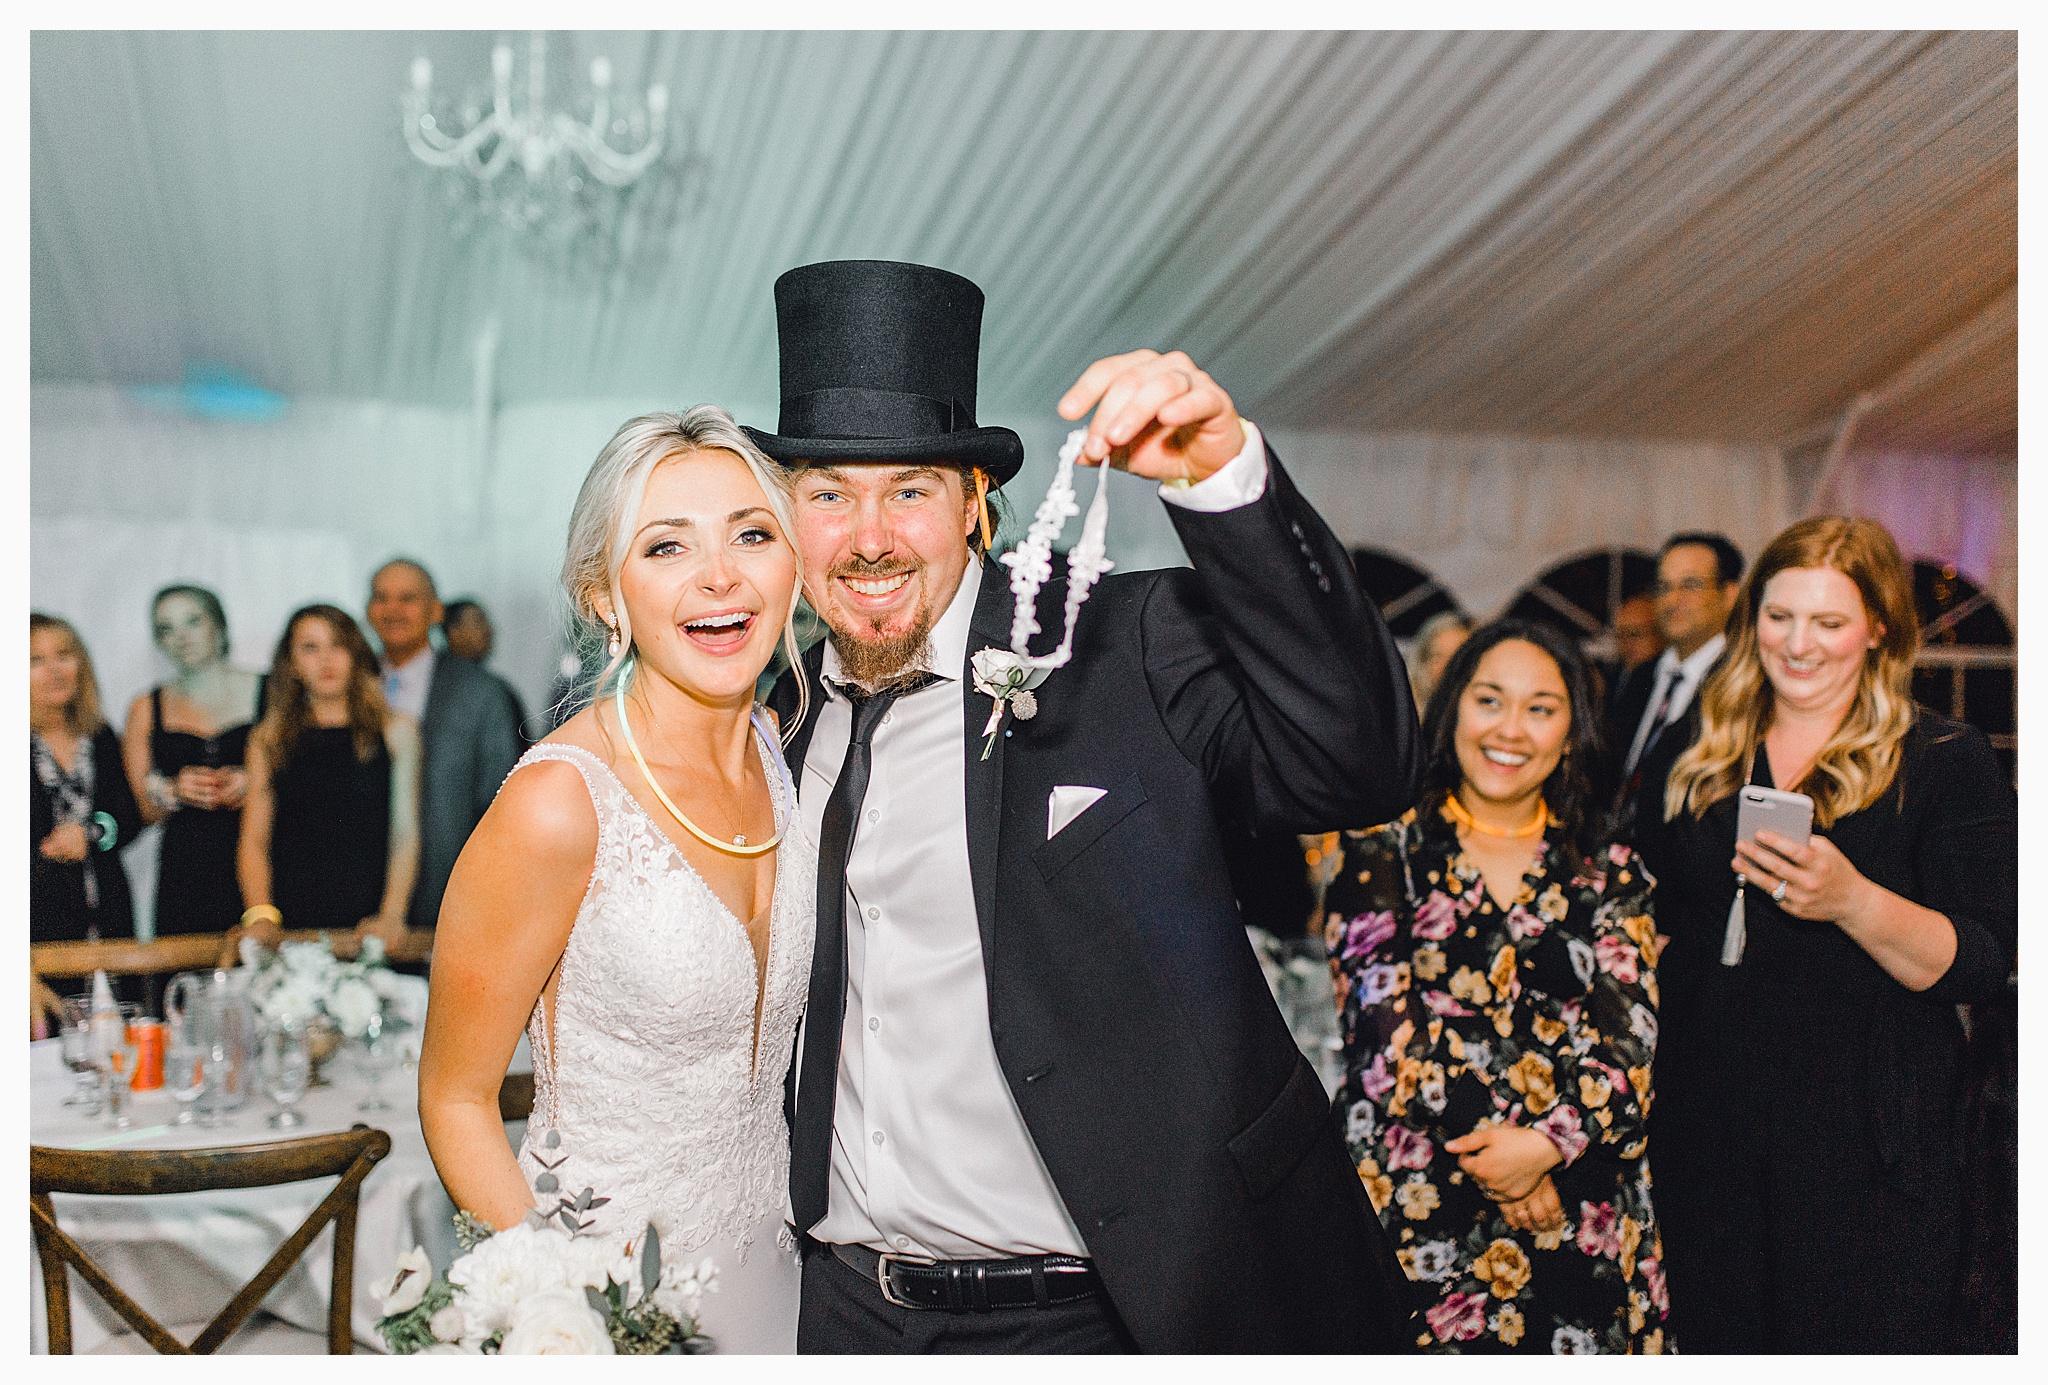 Emma Rose Company Light and Airy Wedding Photographer, Beautiful fall wedding at Rock Creek Gardens Venue in Puyallup, Washington._0116.jpg